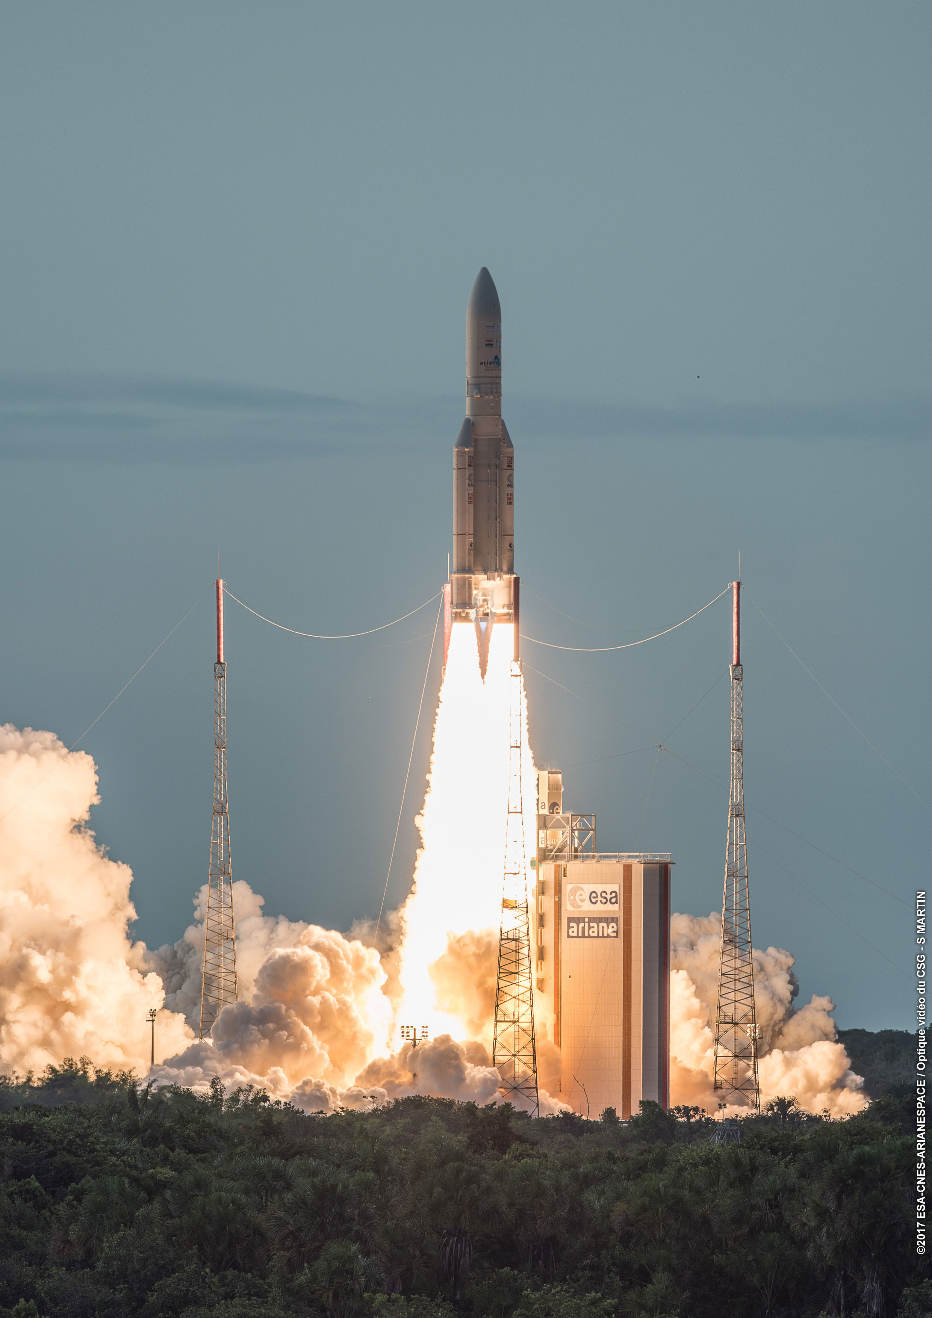 80th consecutive success for Ariane 5